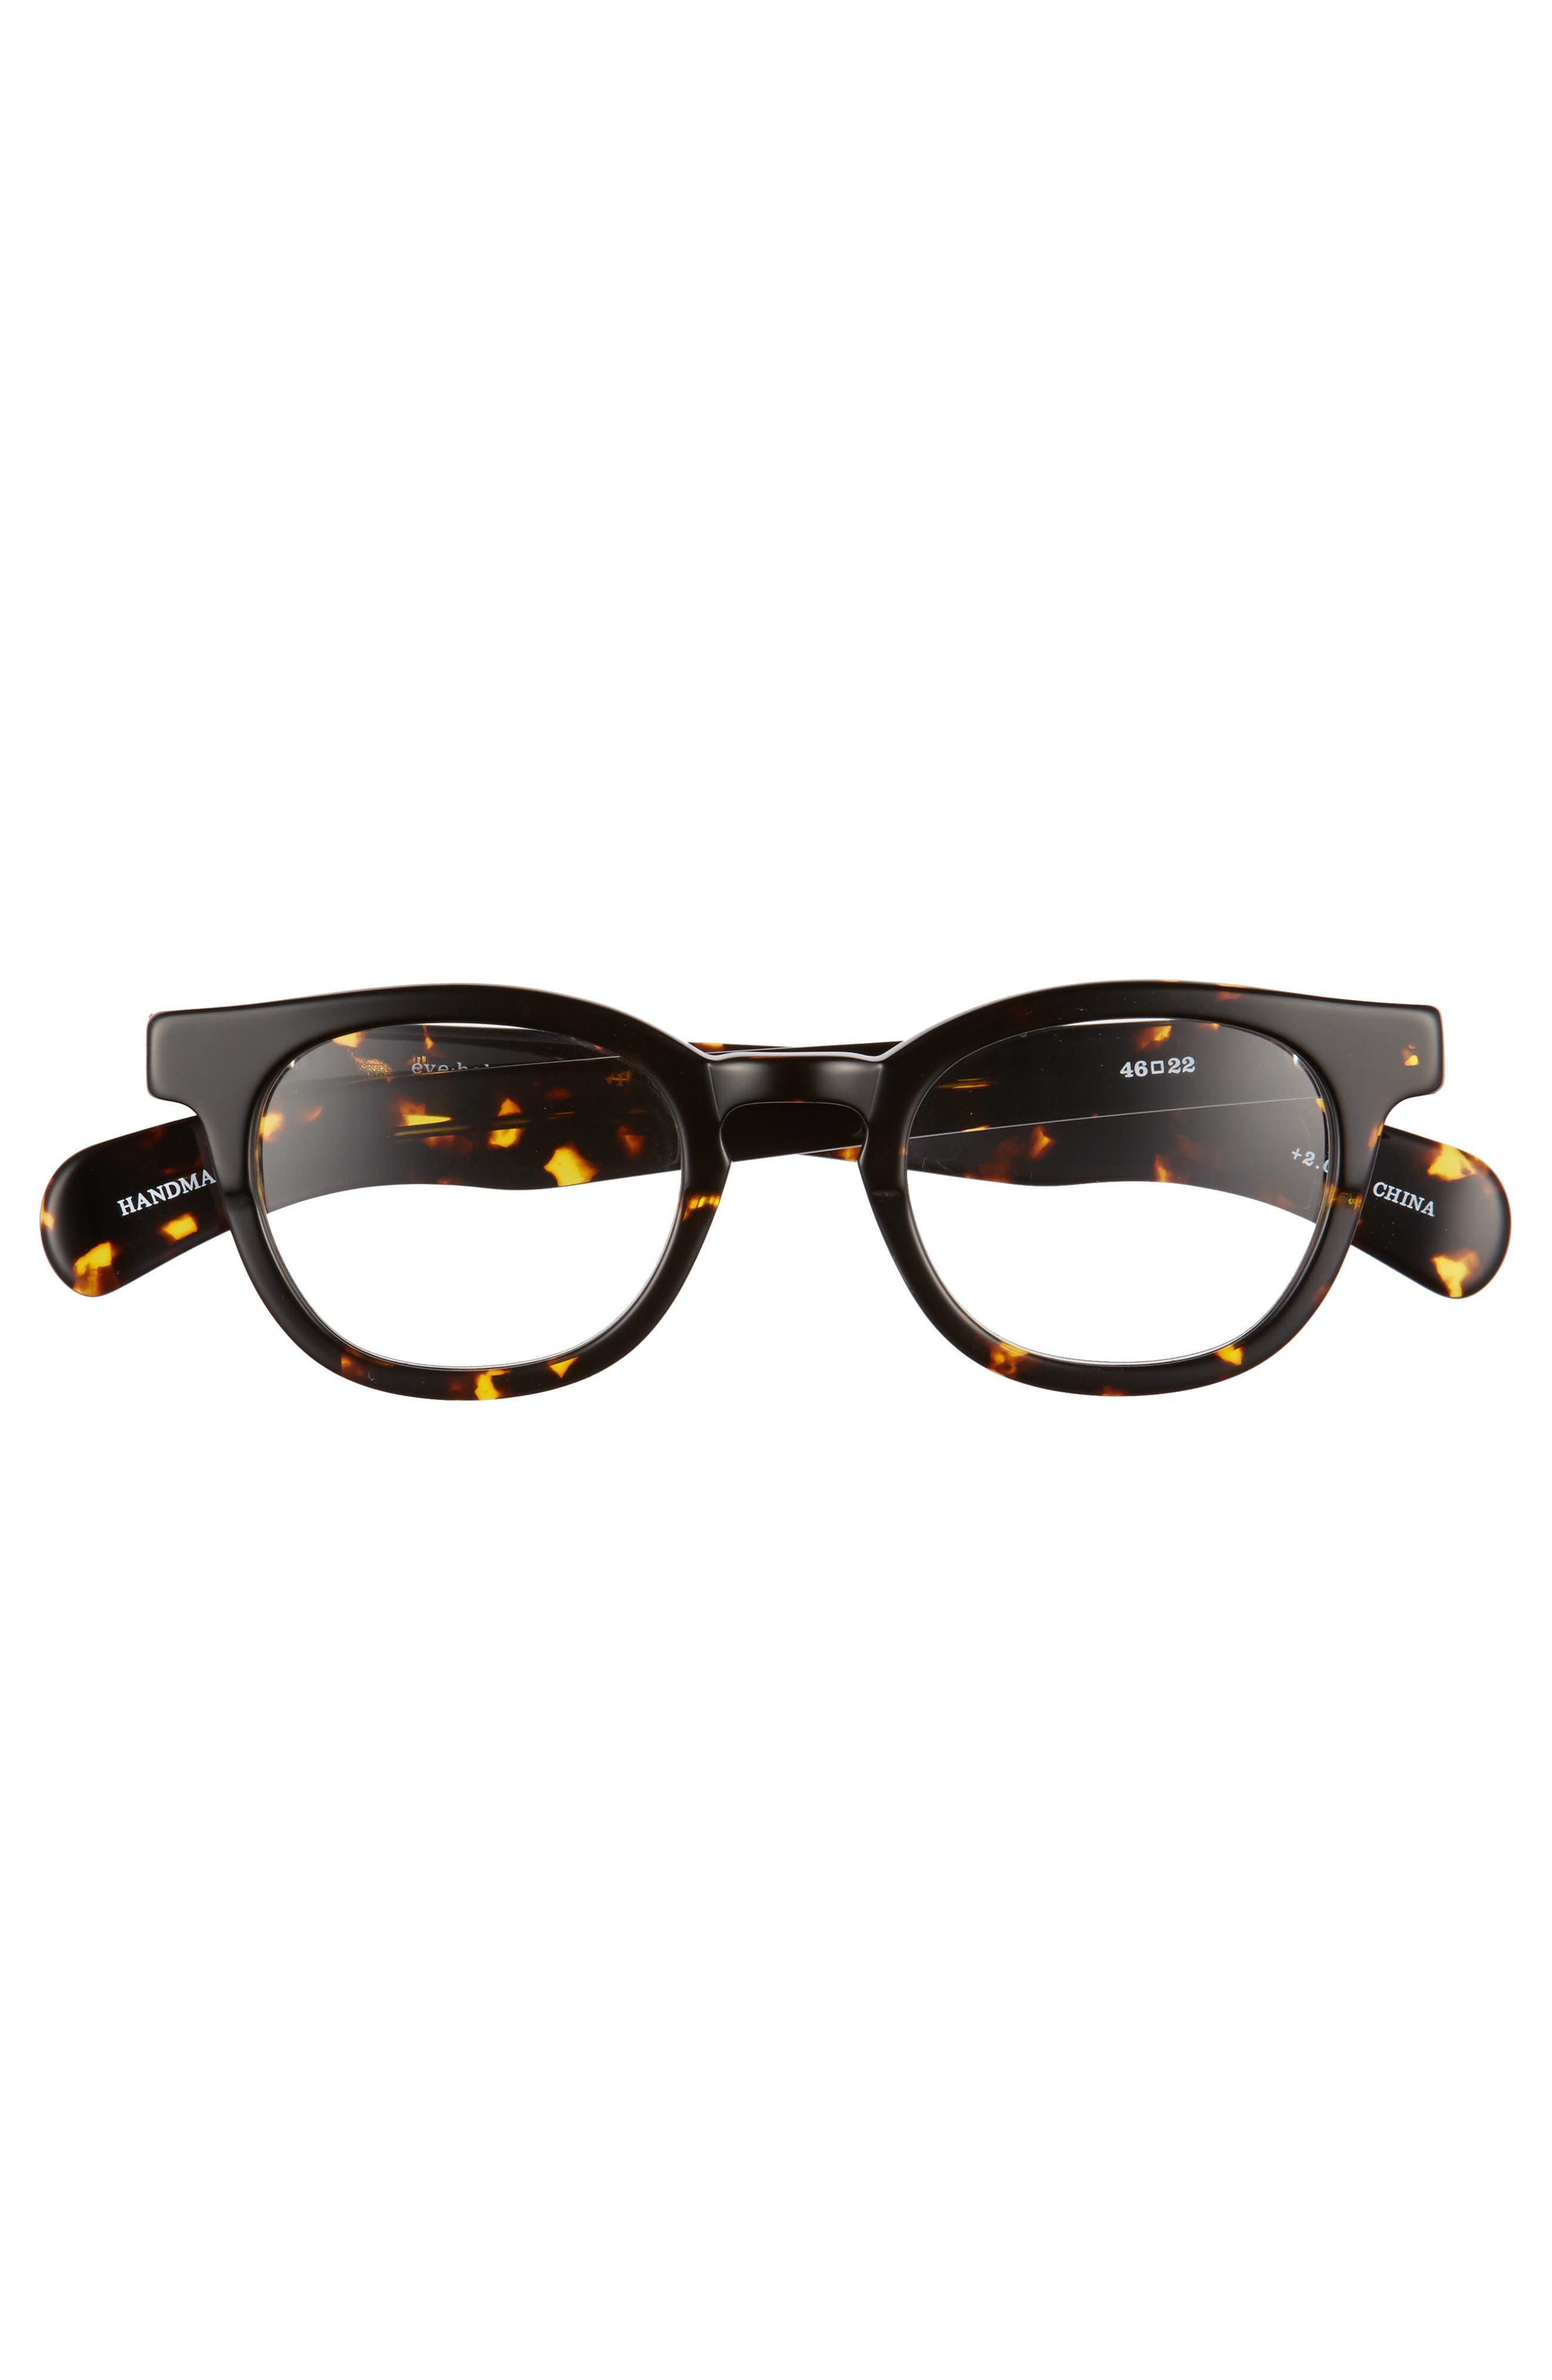 Total Wit 46mm Reading Glasses,                             Alternate thumbnail 2, color,                             TORTOISE